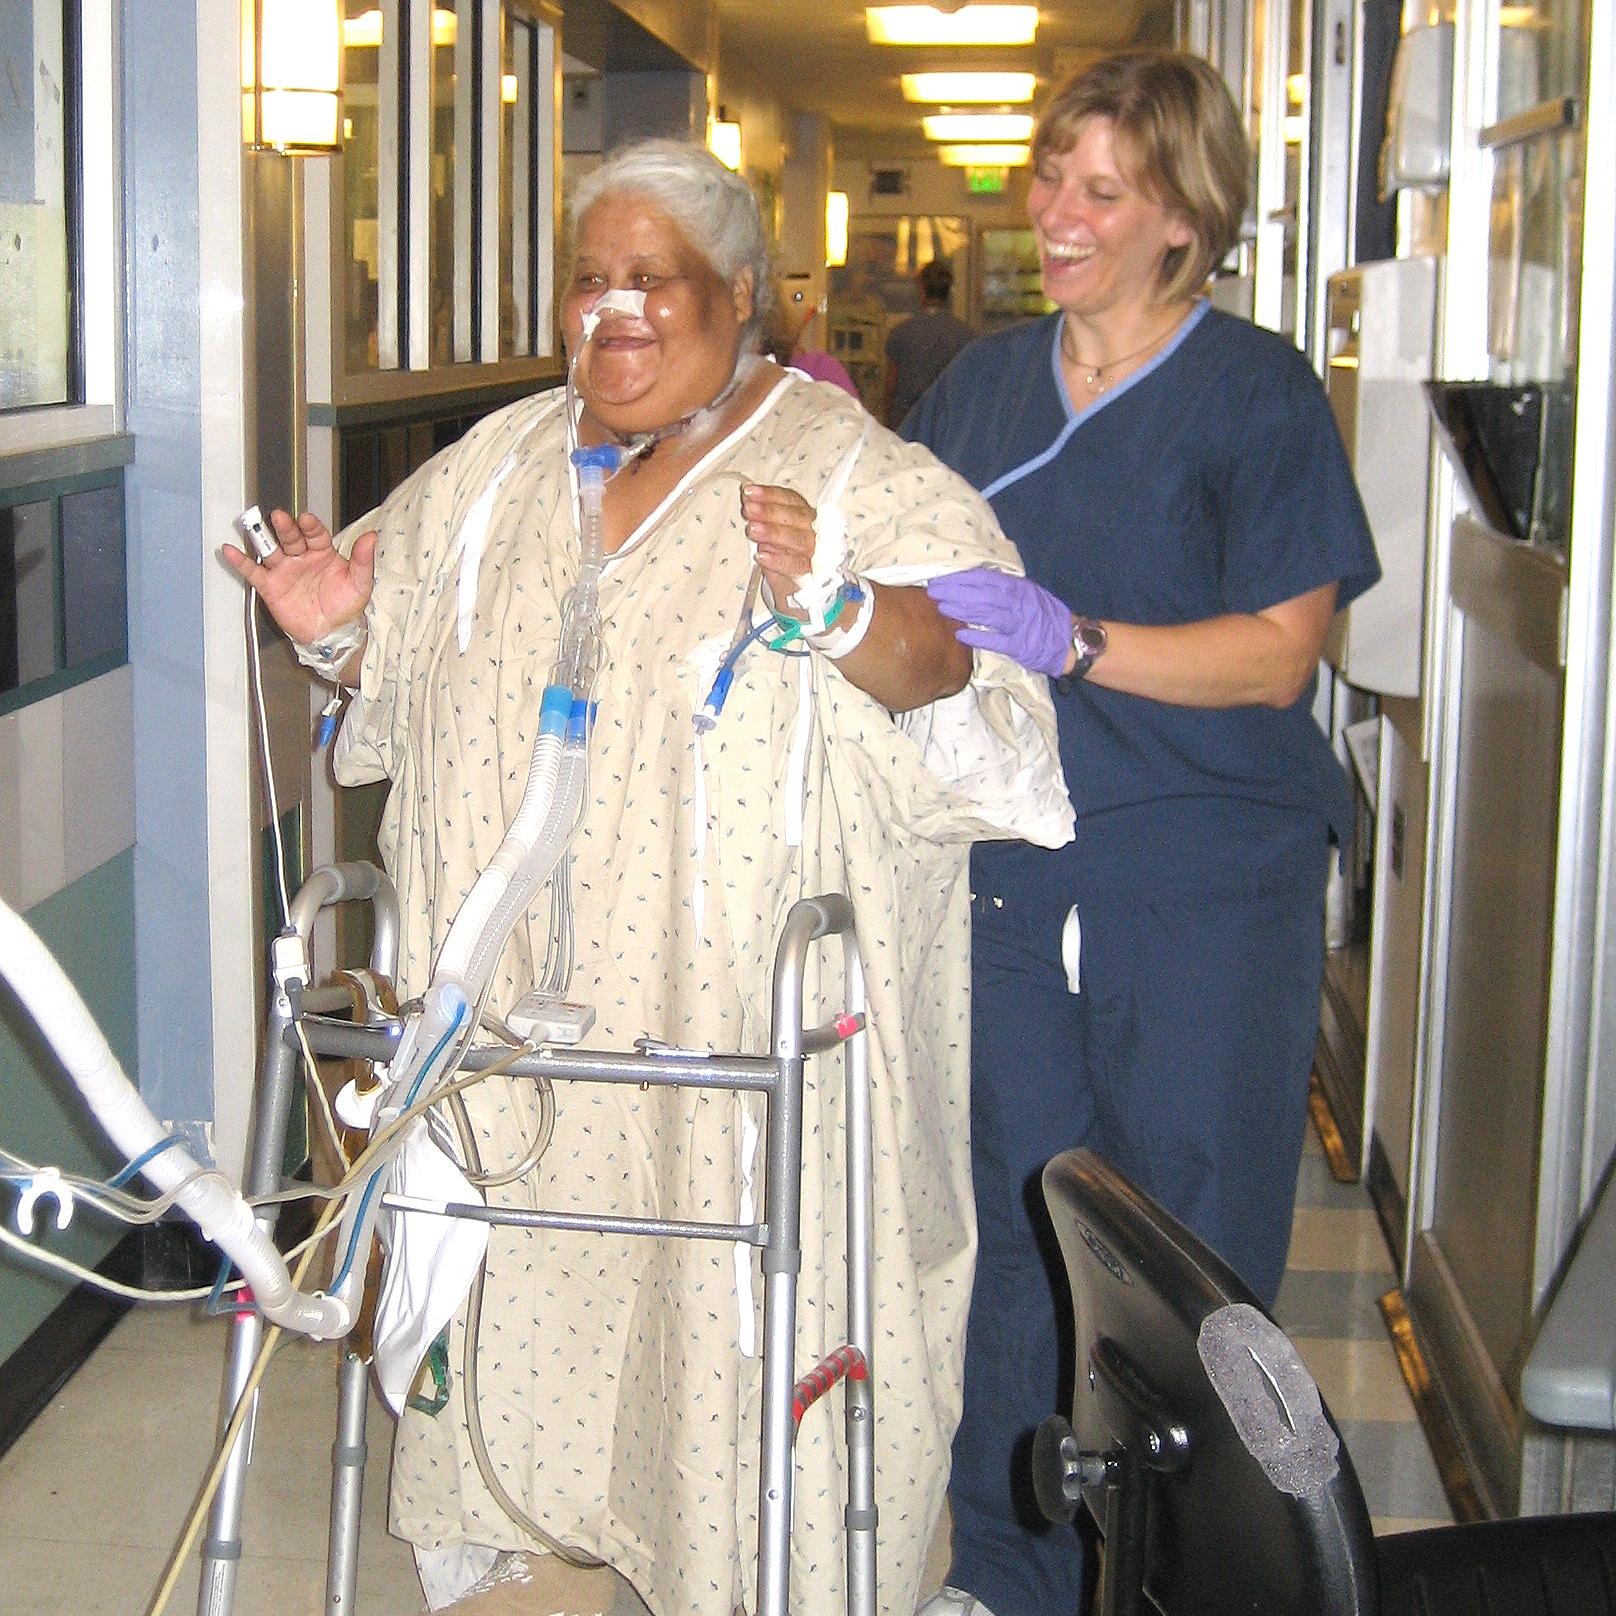 AMP-ICU - Johns Hopkins HealthCare Solutions